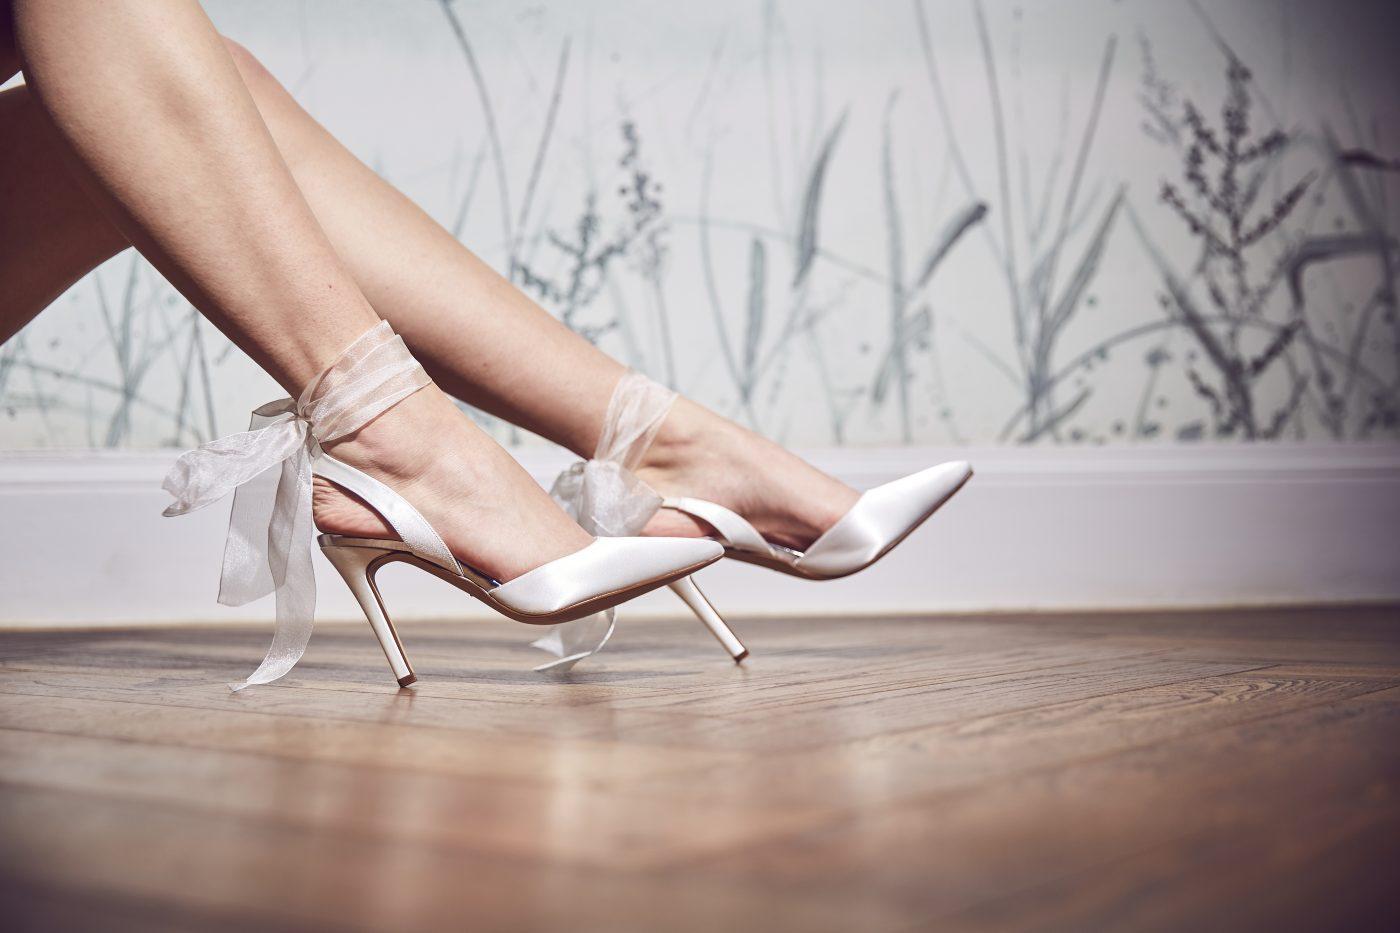 "<a href=""https://www.rainbowclub.co.uk/pandora-ribbon-bow-court-wedding-shoes"" target=""_blank"" rel=""noopener noreferrer"">Pandora Bridal Shoes by Rainbow Club</a> £85"